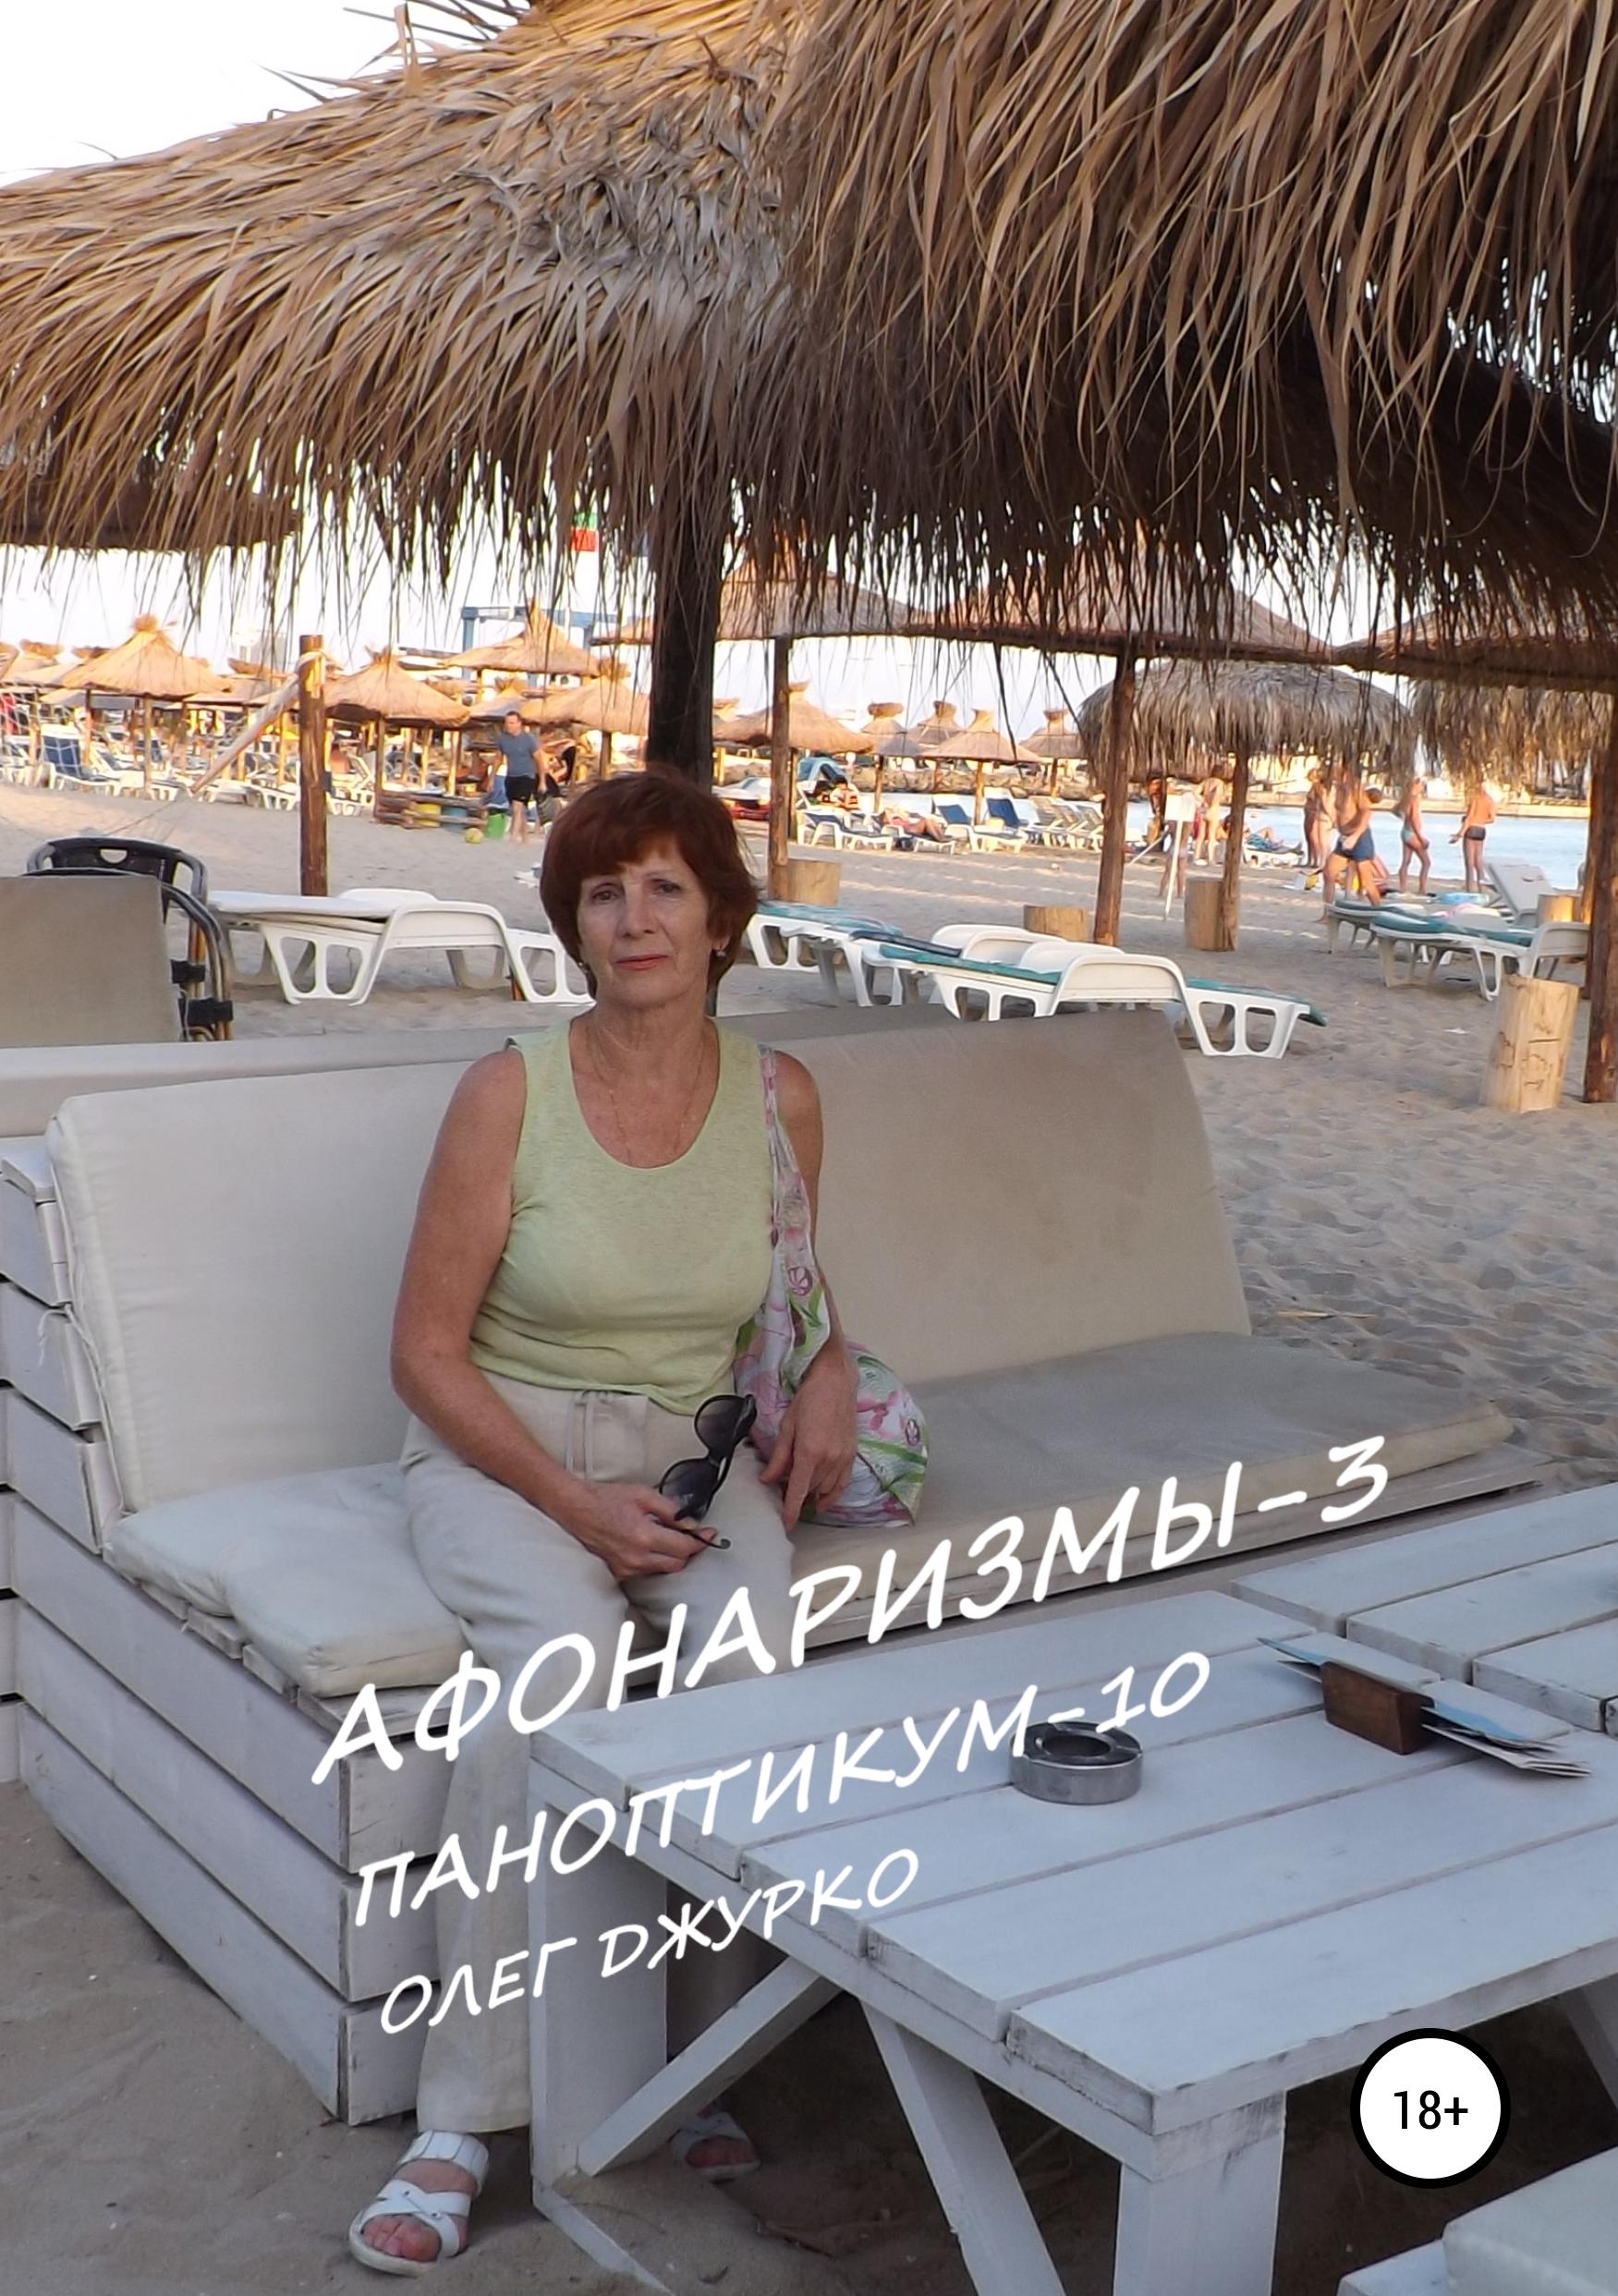 Олег Джурко АФОНАРИЗМЫ-3 ПАНОПТИКУМ-10 цена